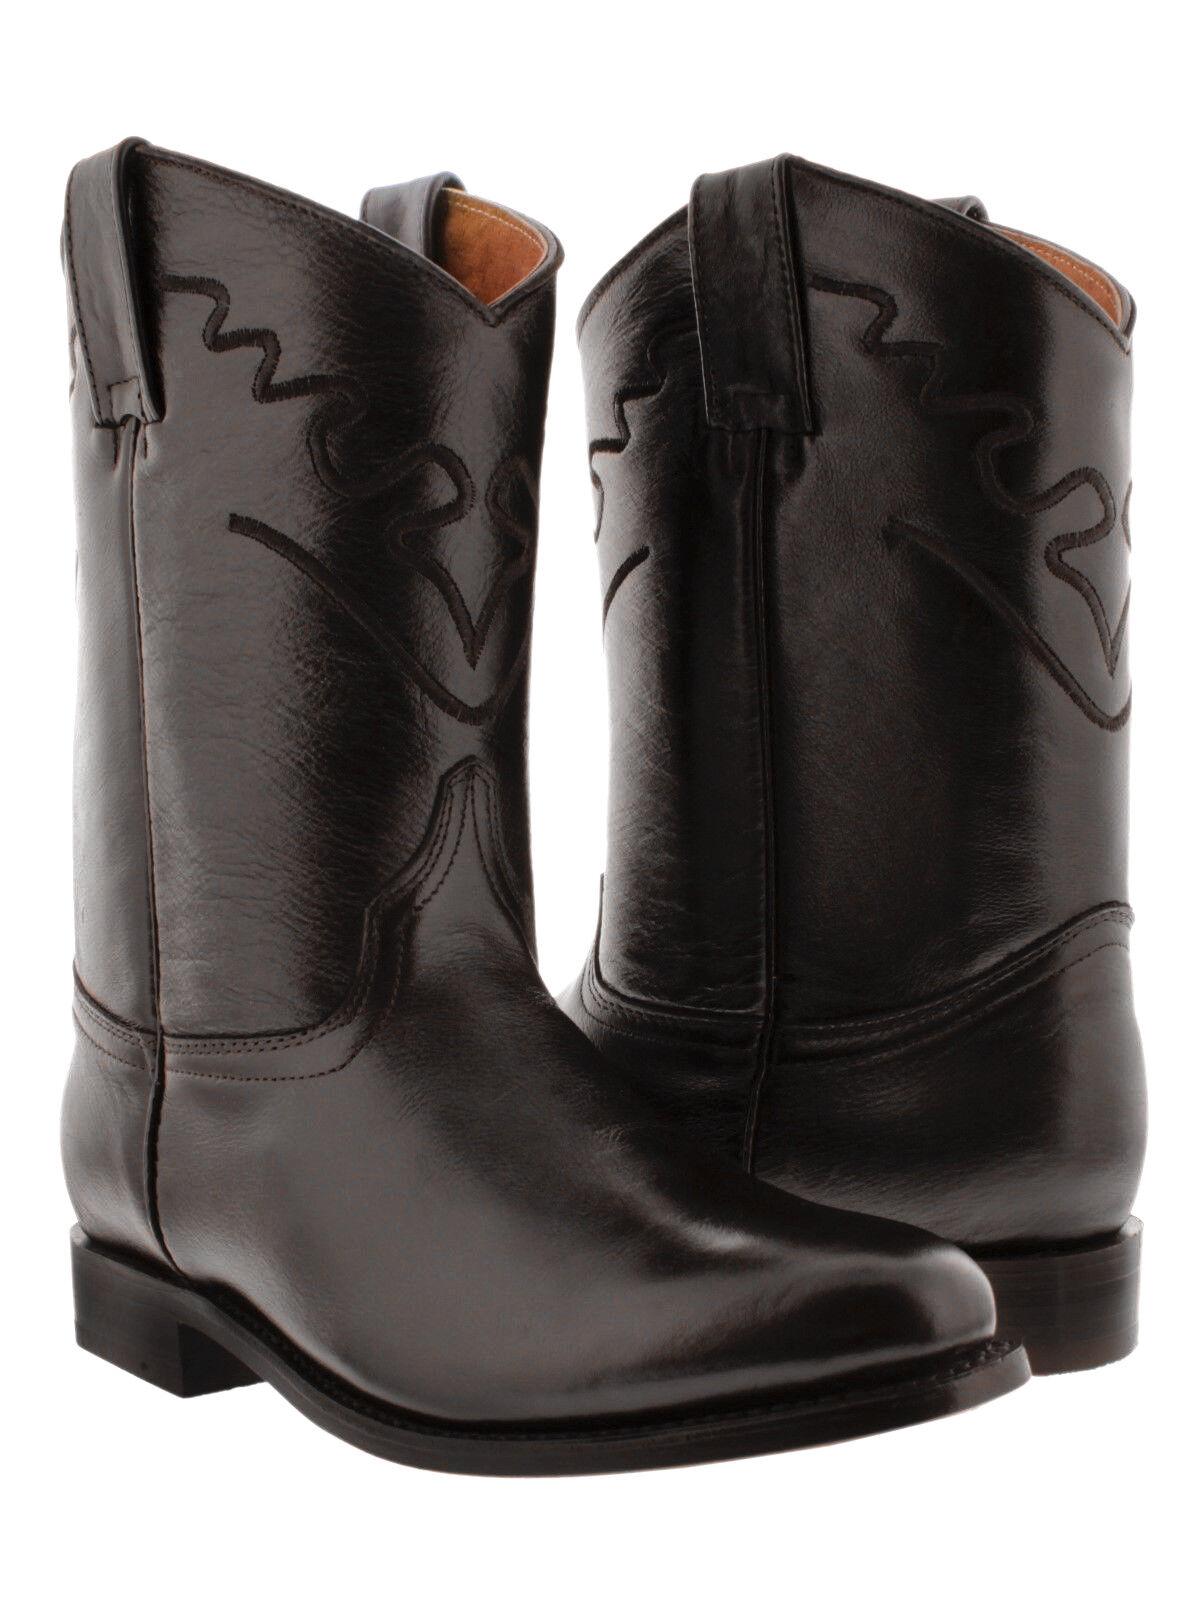 Uomo Chocolate Brown All Real Genuine Pelle Western Western Western Riding Cowboy Stivali Roper 7a4ba5